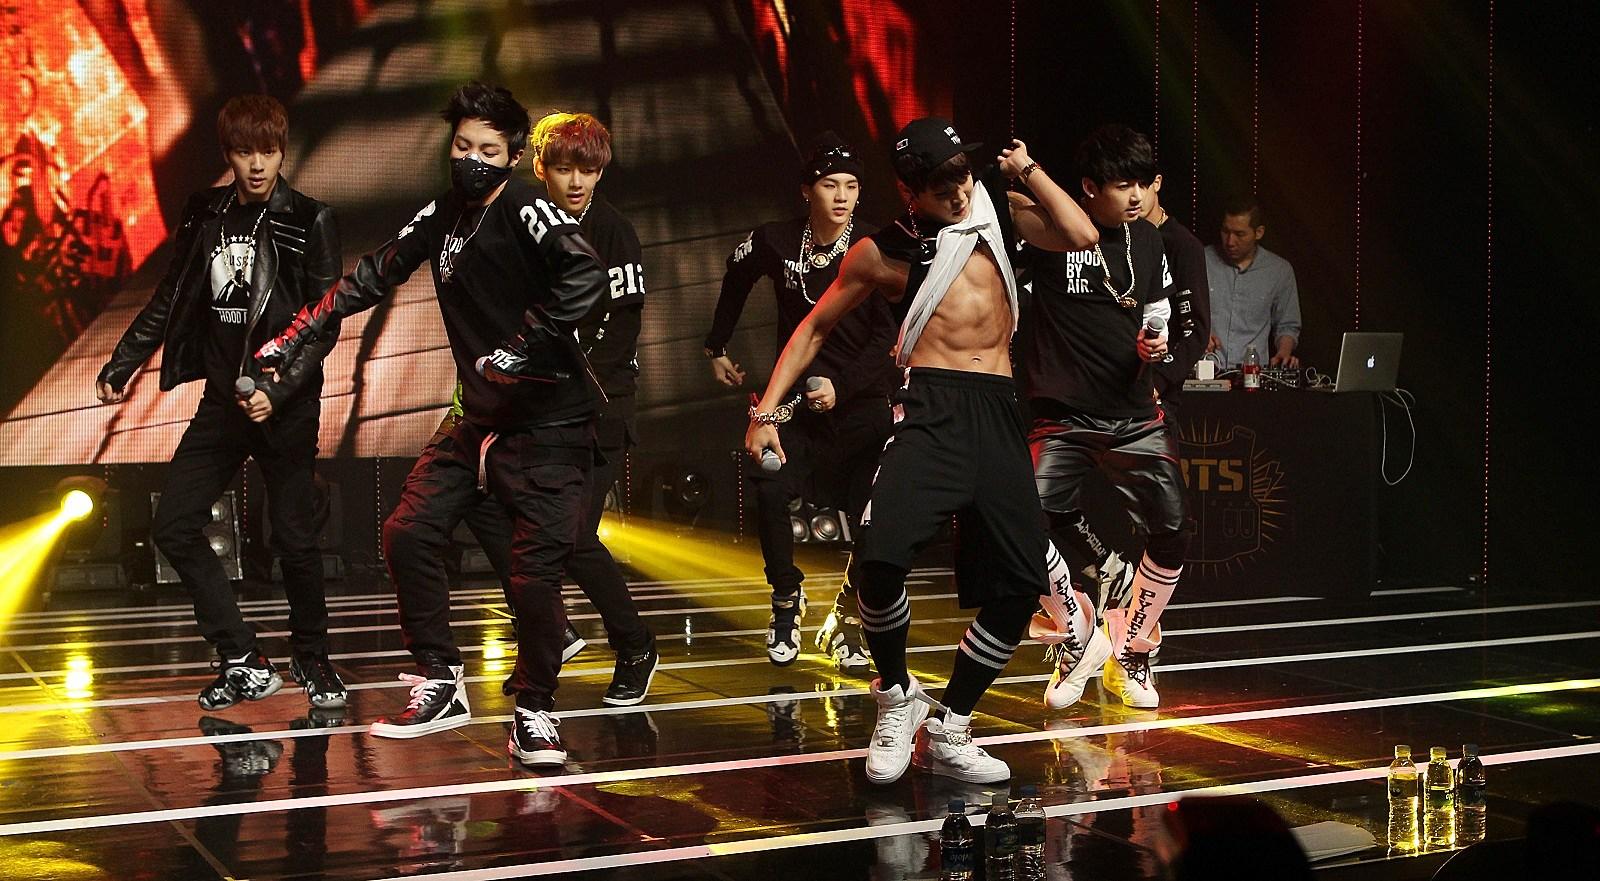 BTS Respond To Death of Jonghyun, Mental Health Struggles